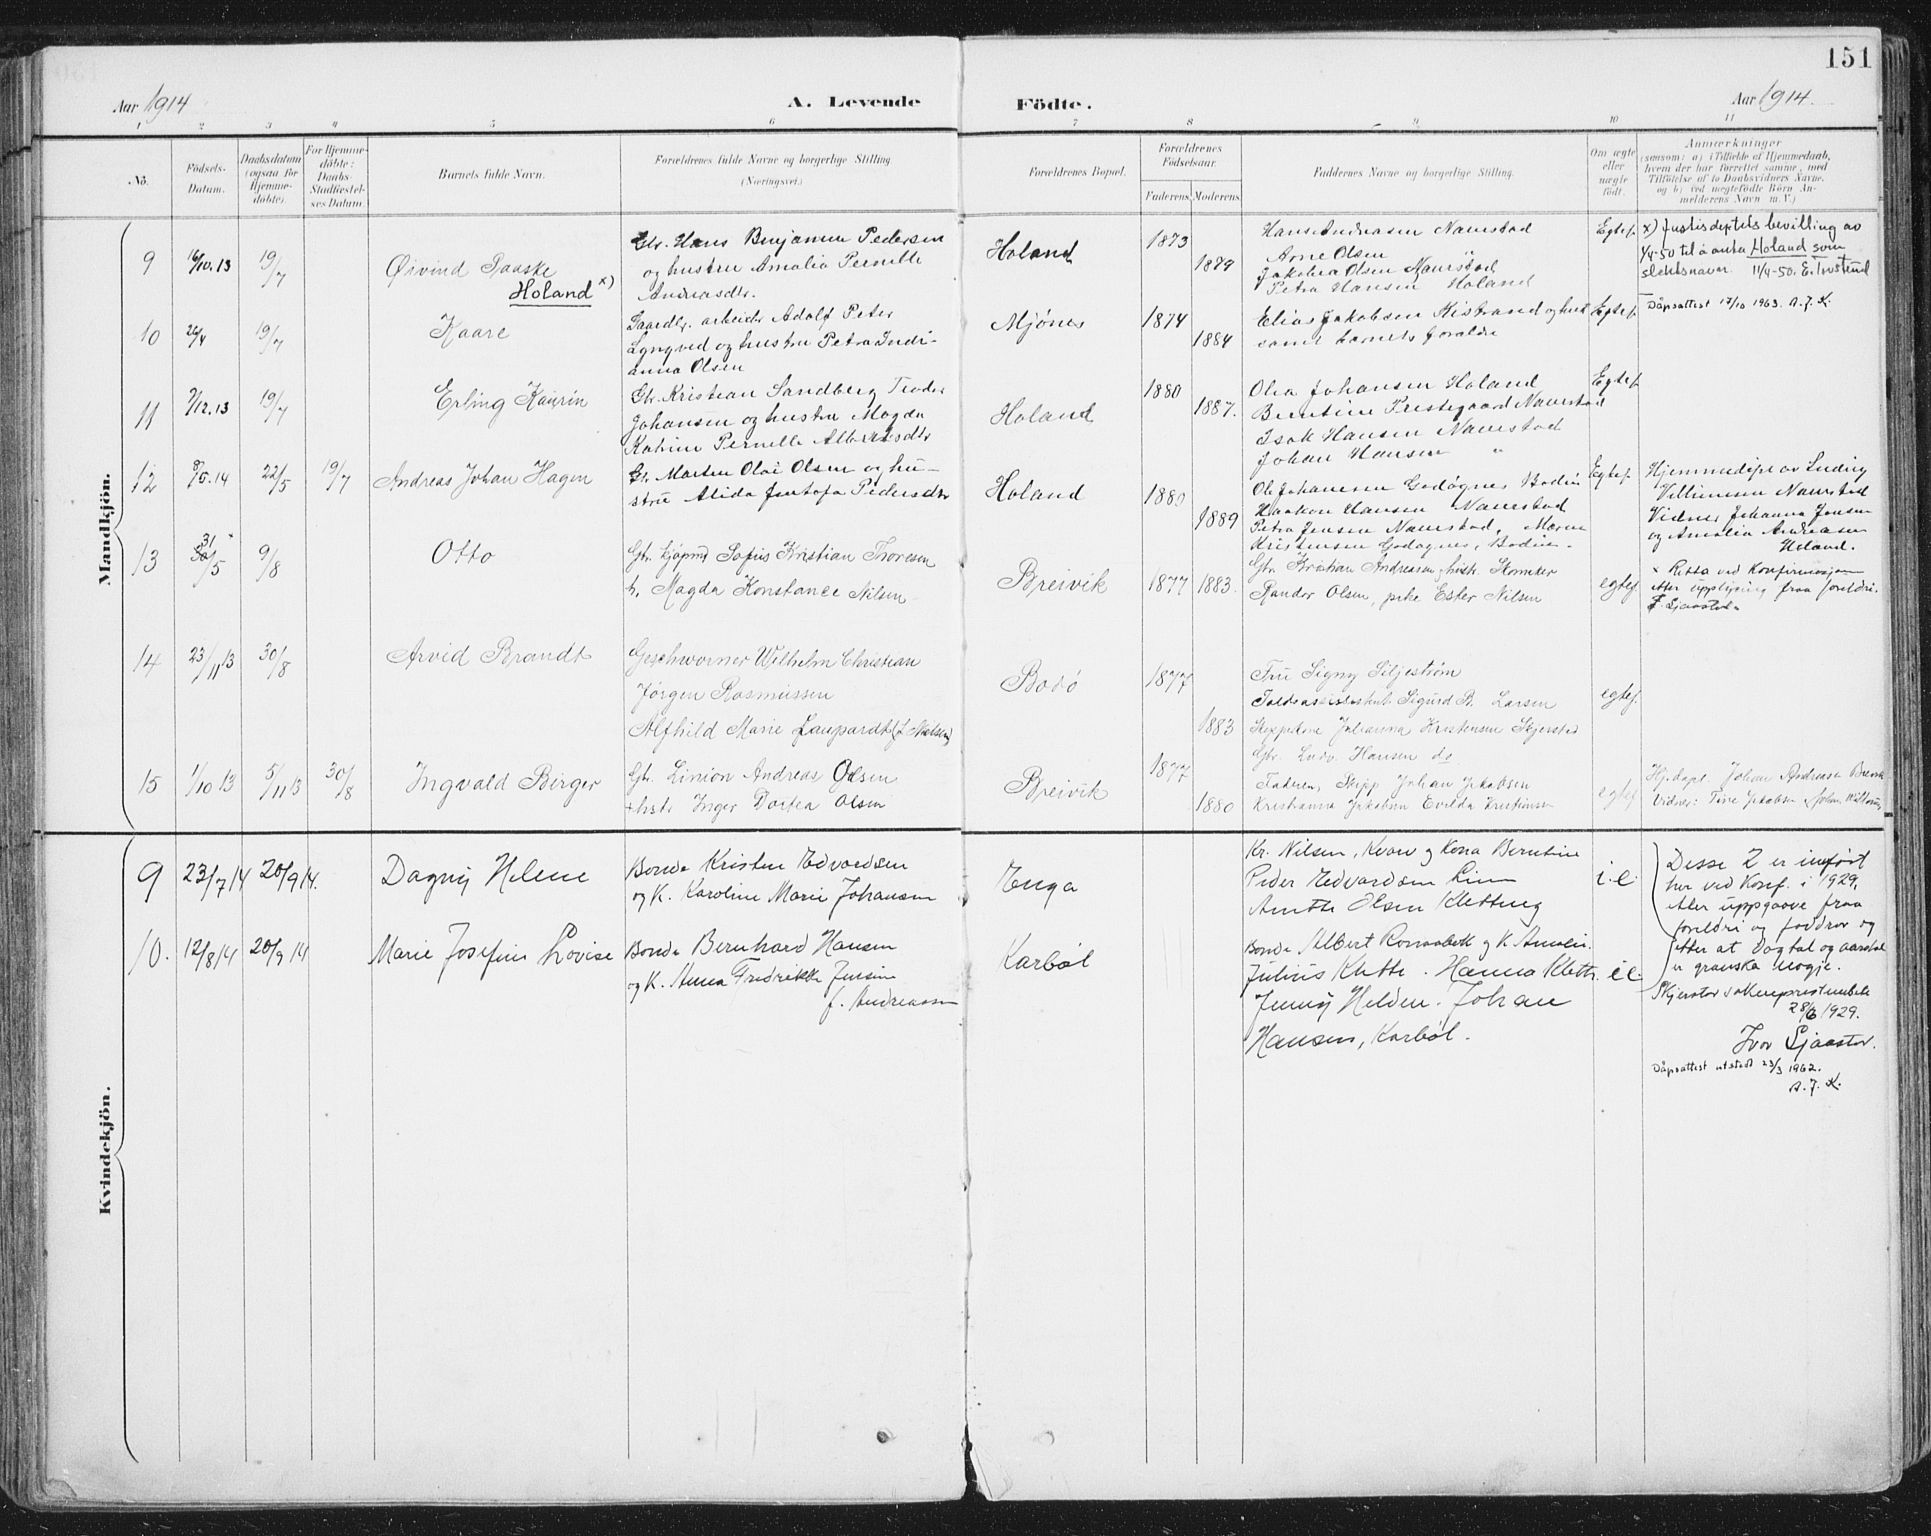 SAT, Ministerialprotokoller, klokkerbøker og fødselsregistre - Nordland, 852/L0741: Ministerialbok nr. 852A11, 1894-1917, s. 151